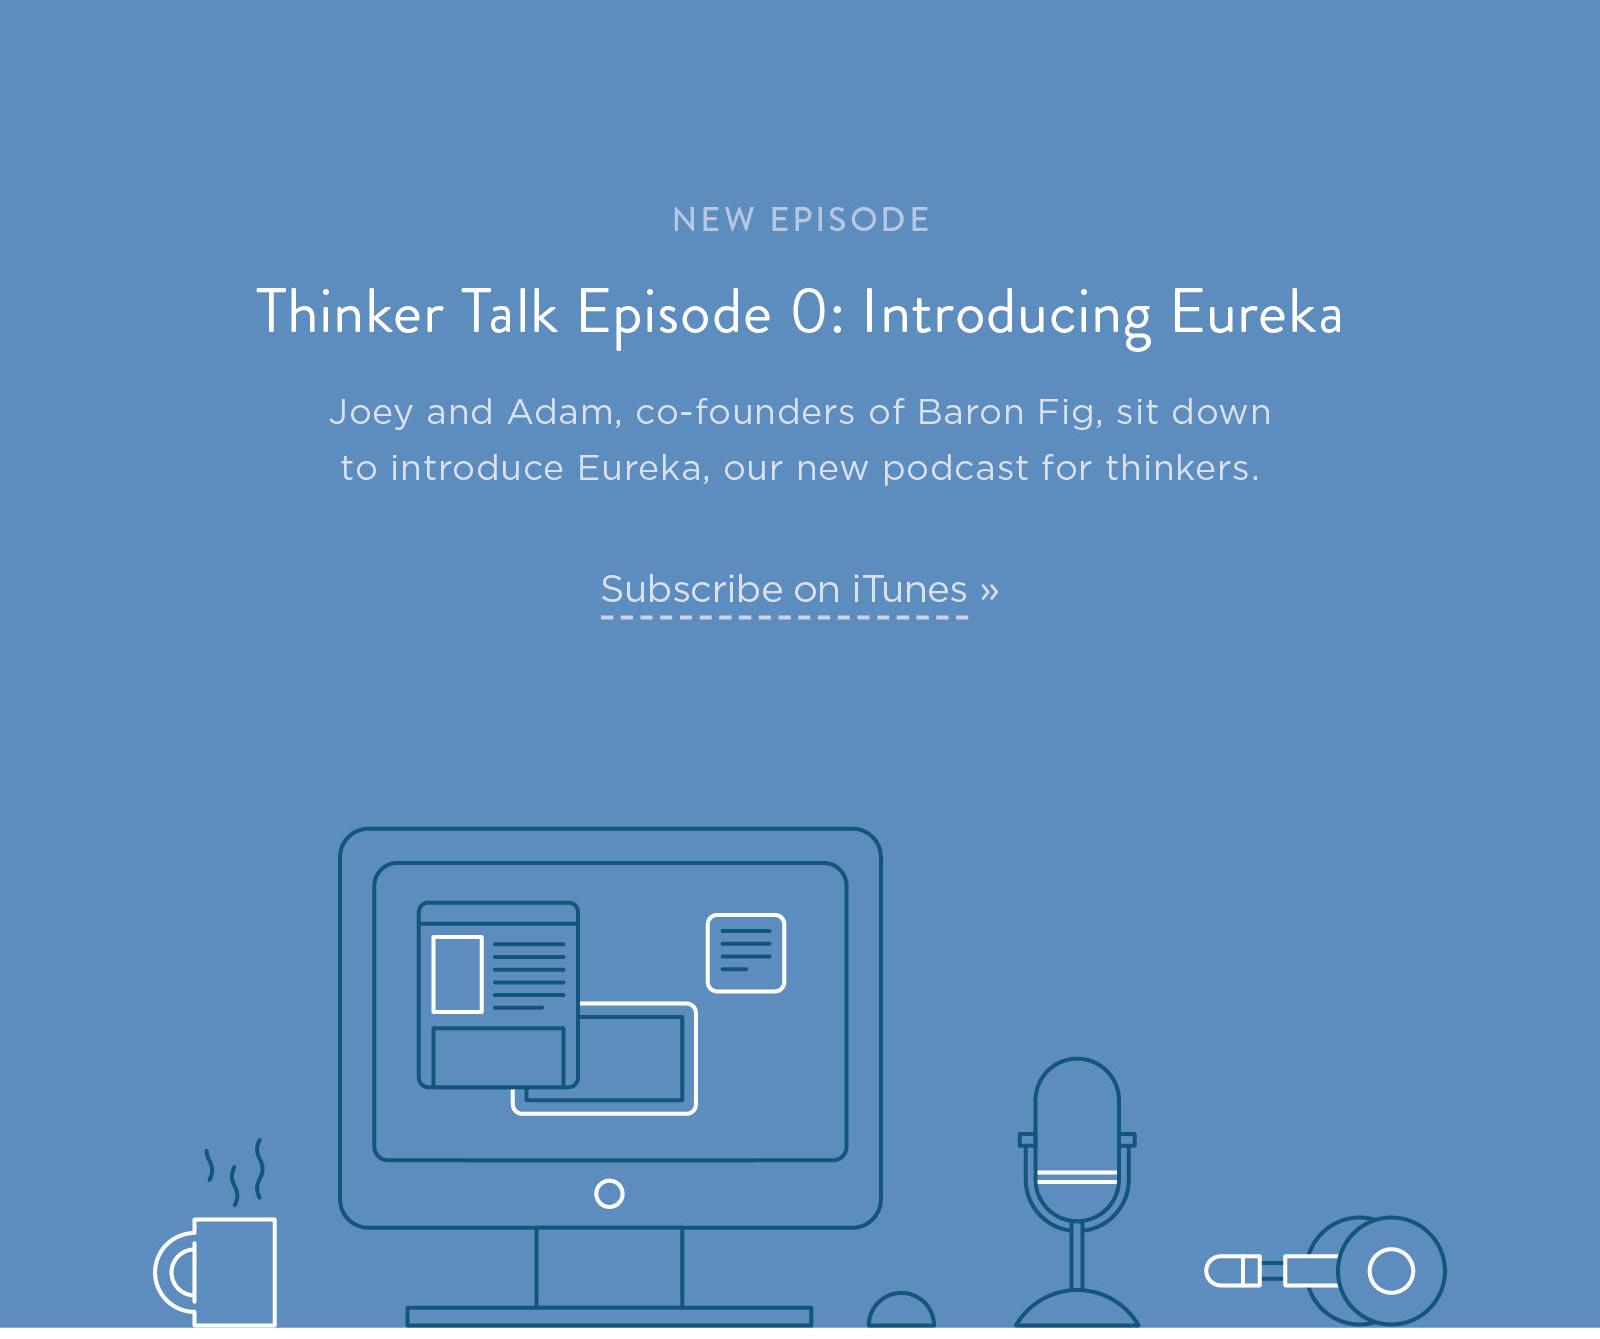 Thinker Talk Episode 0: Introducing Eureka